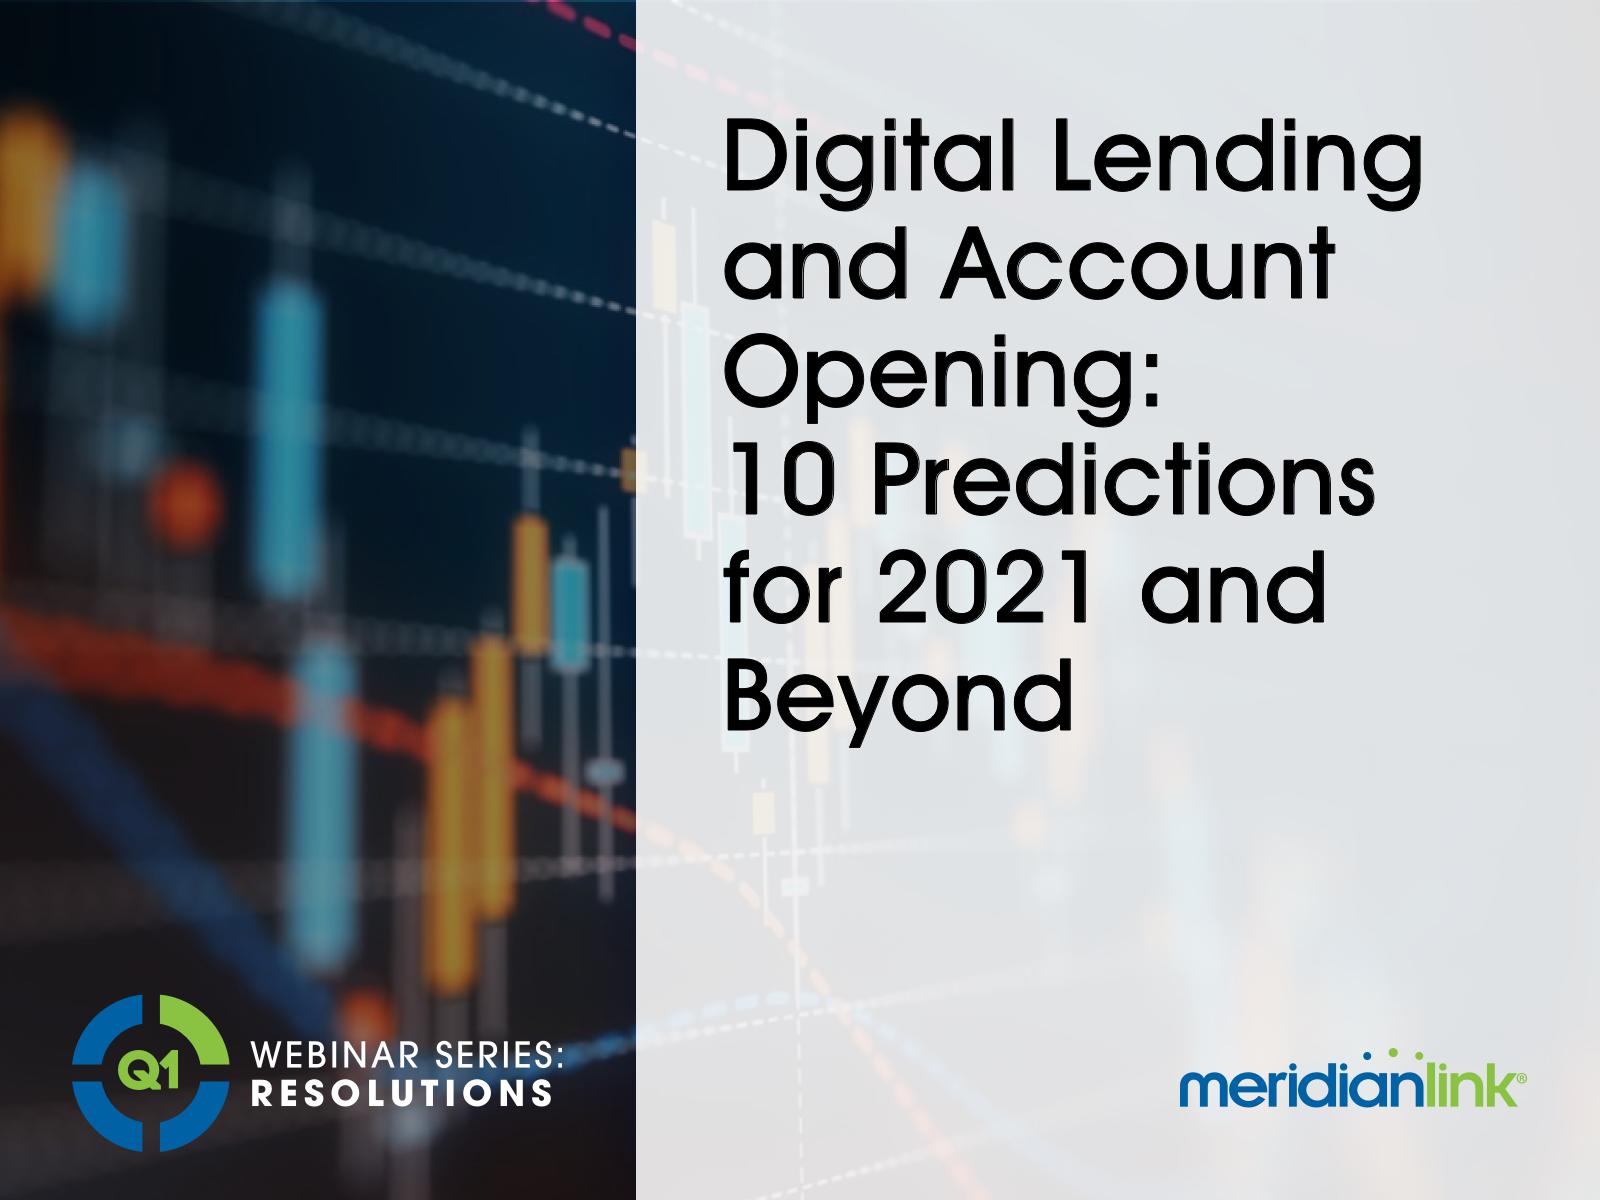 Q1-webinar-digital-lending-account-opening-10-predictions-1